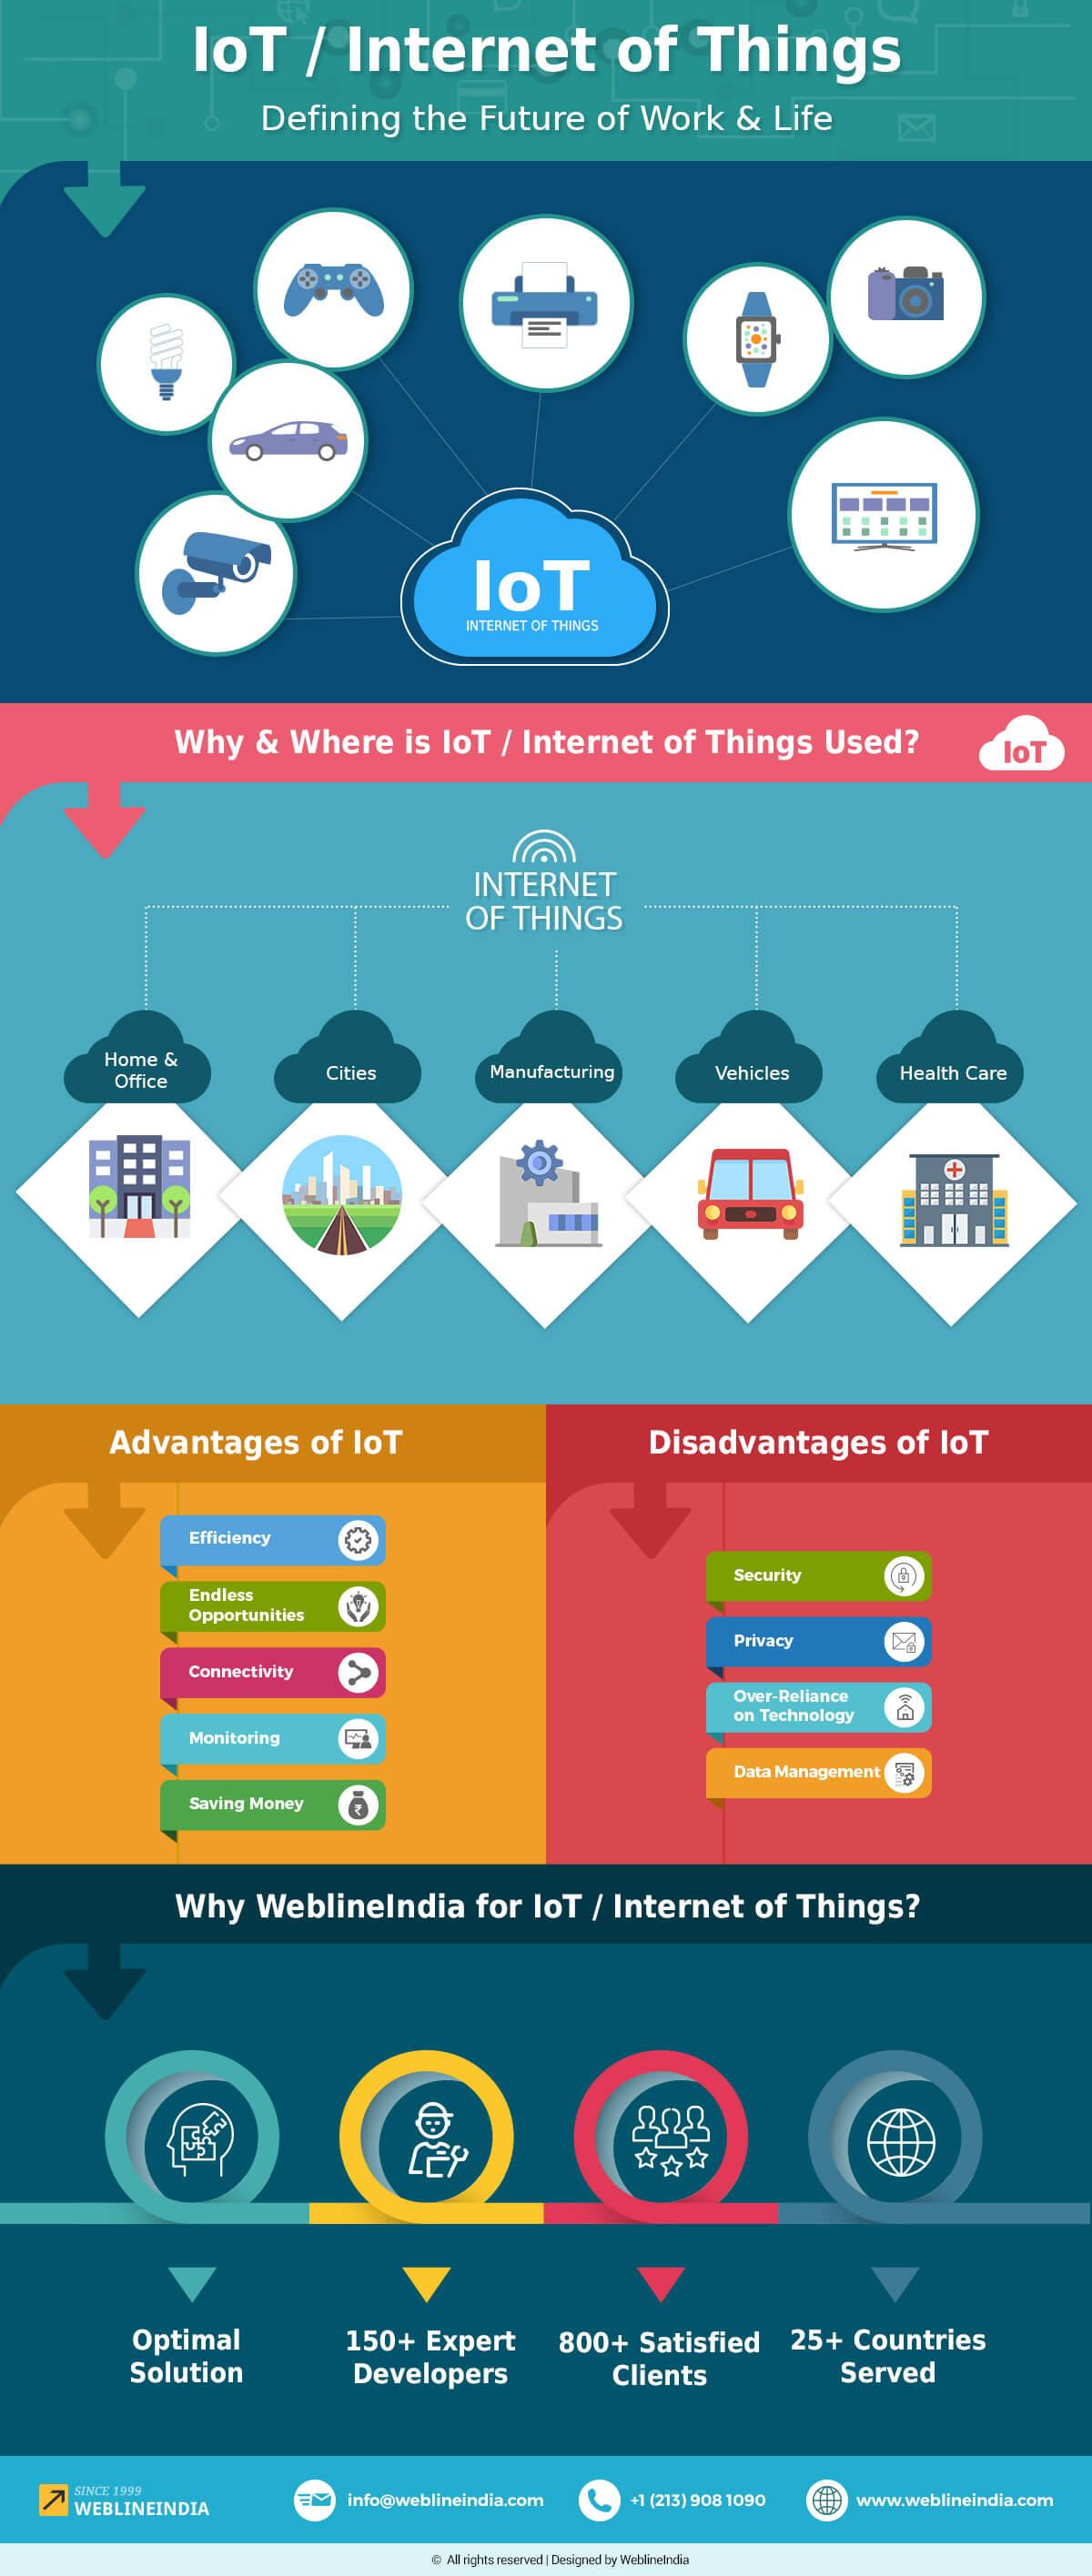 iot-infographic-by-weblineindia